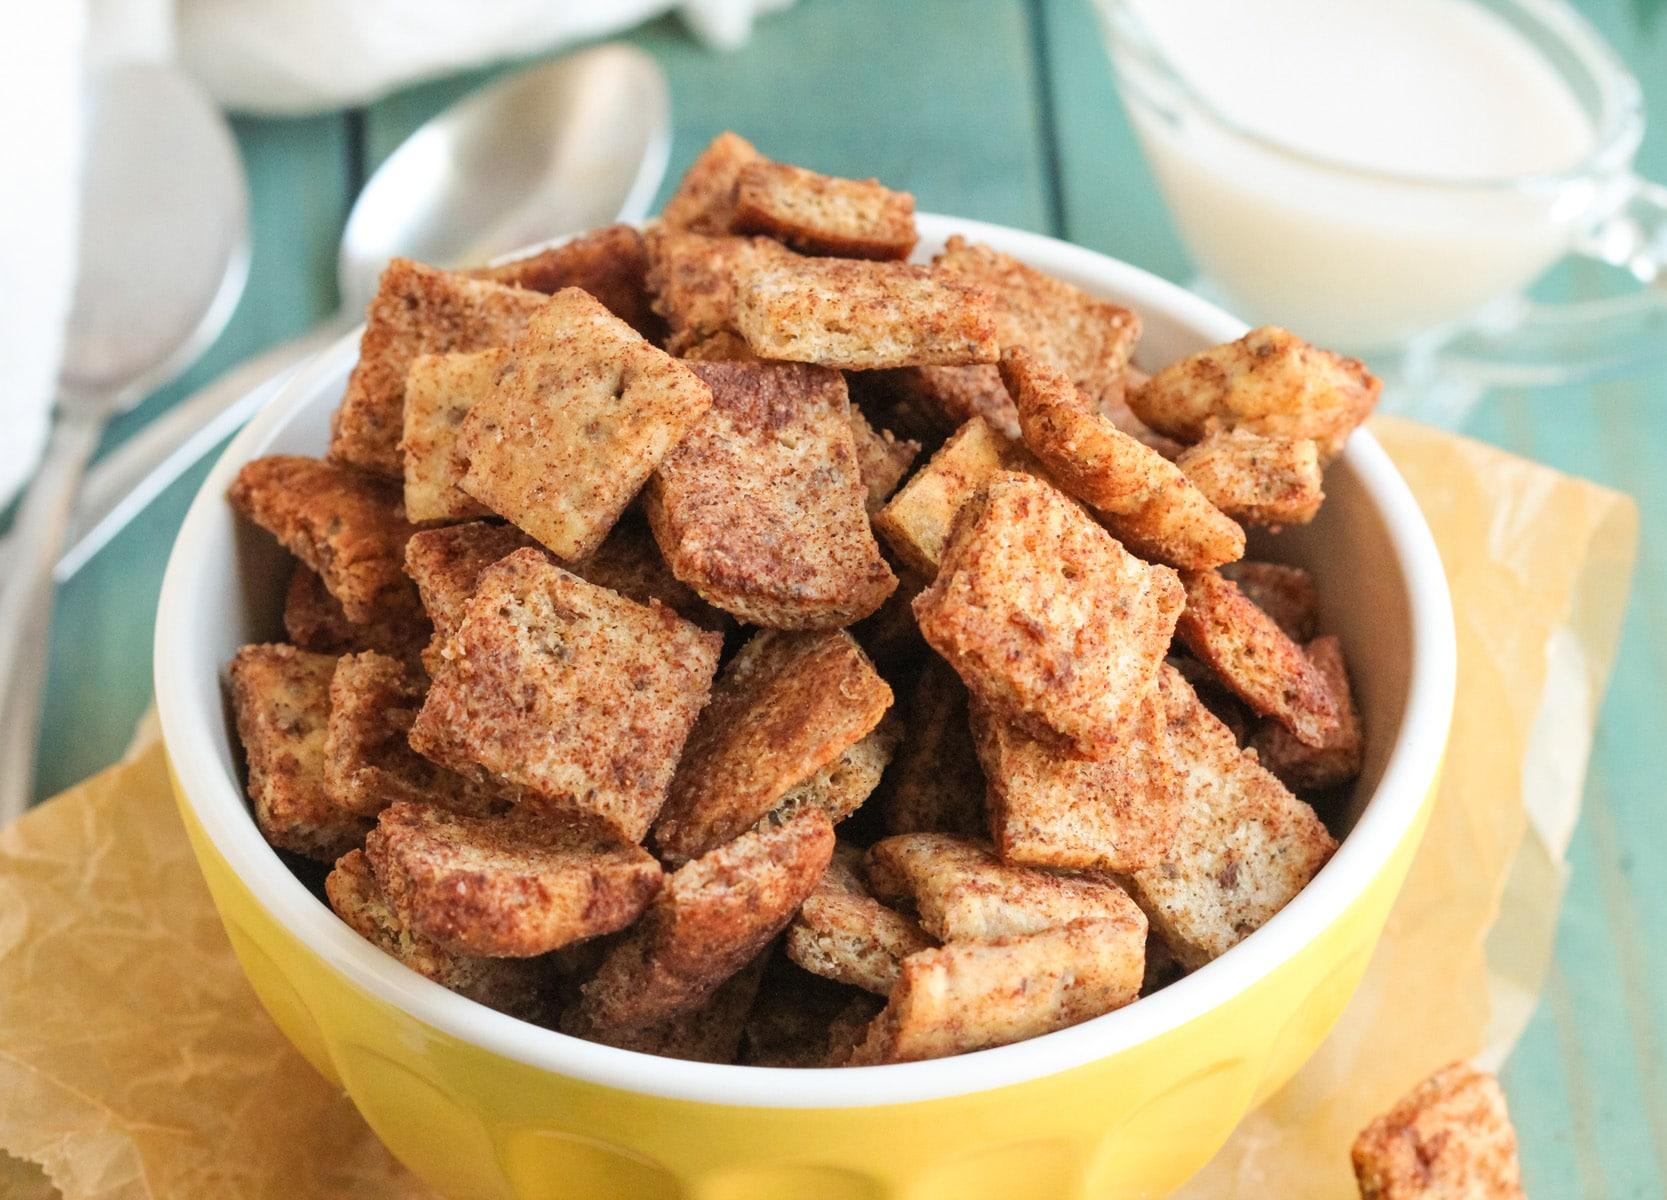 Low Sugar Vegan Cake Recipes: Healthy Homemade Cinnamon Toast Crunch Cereal Recipe (Vegan